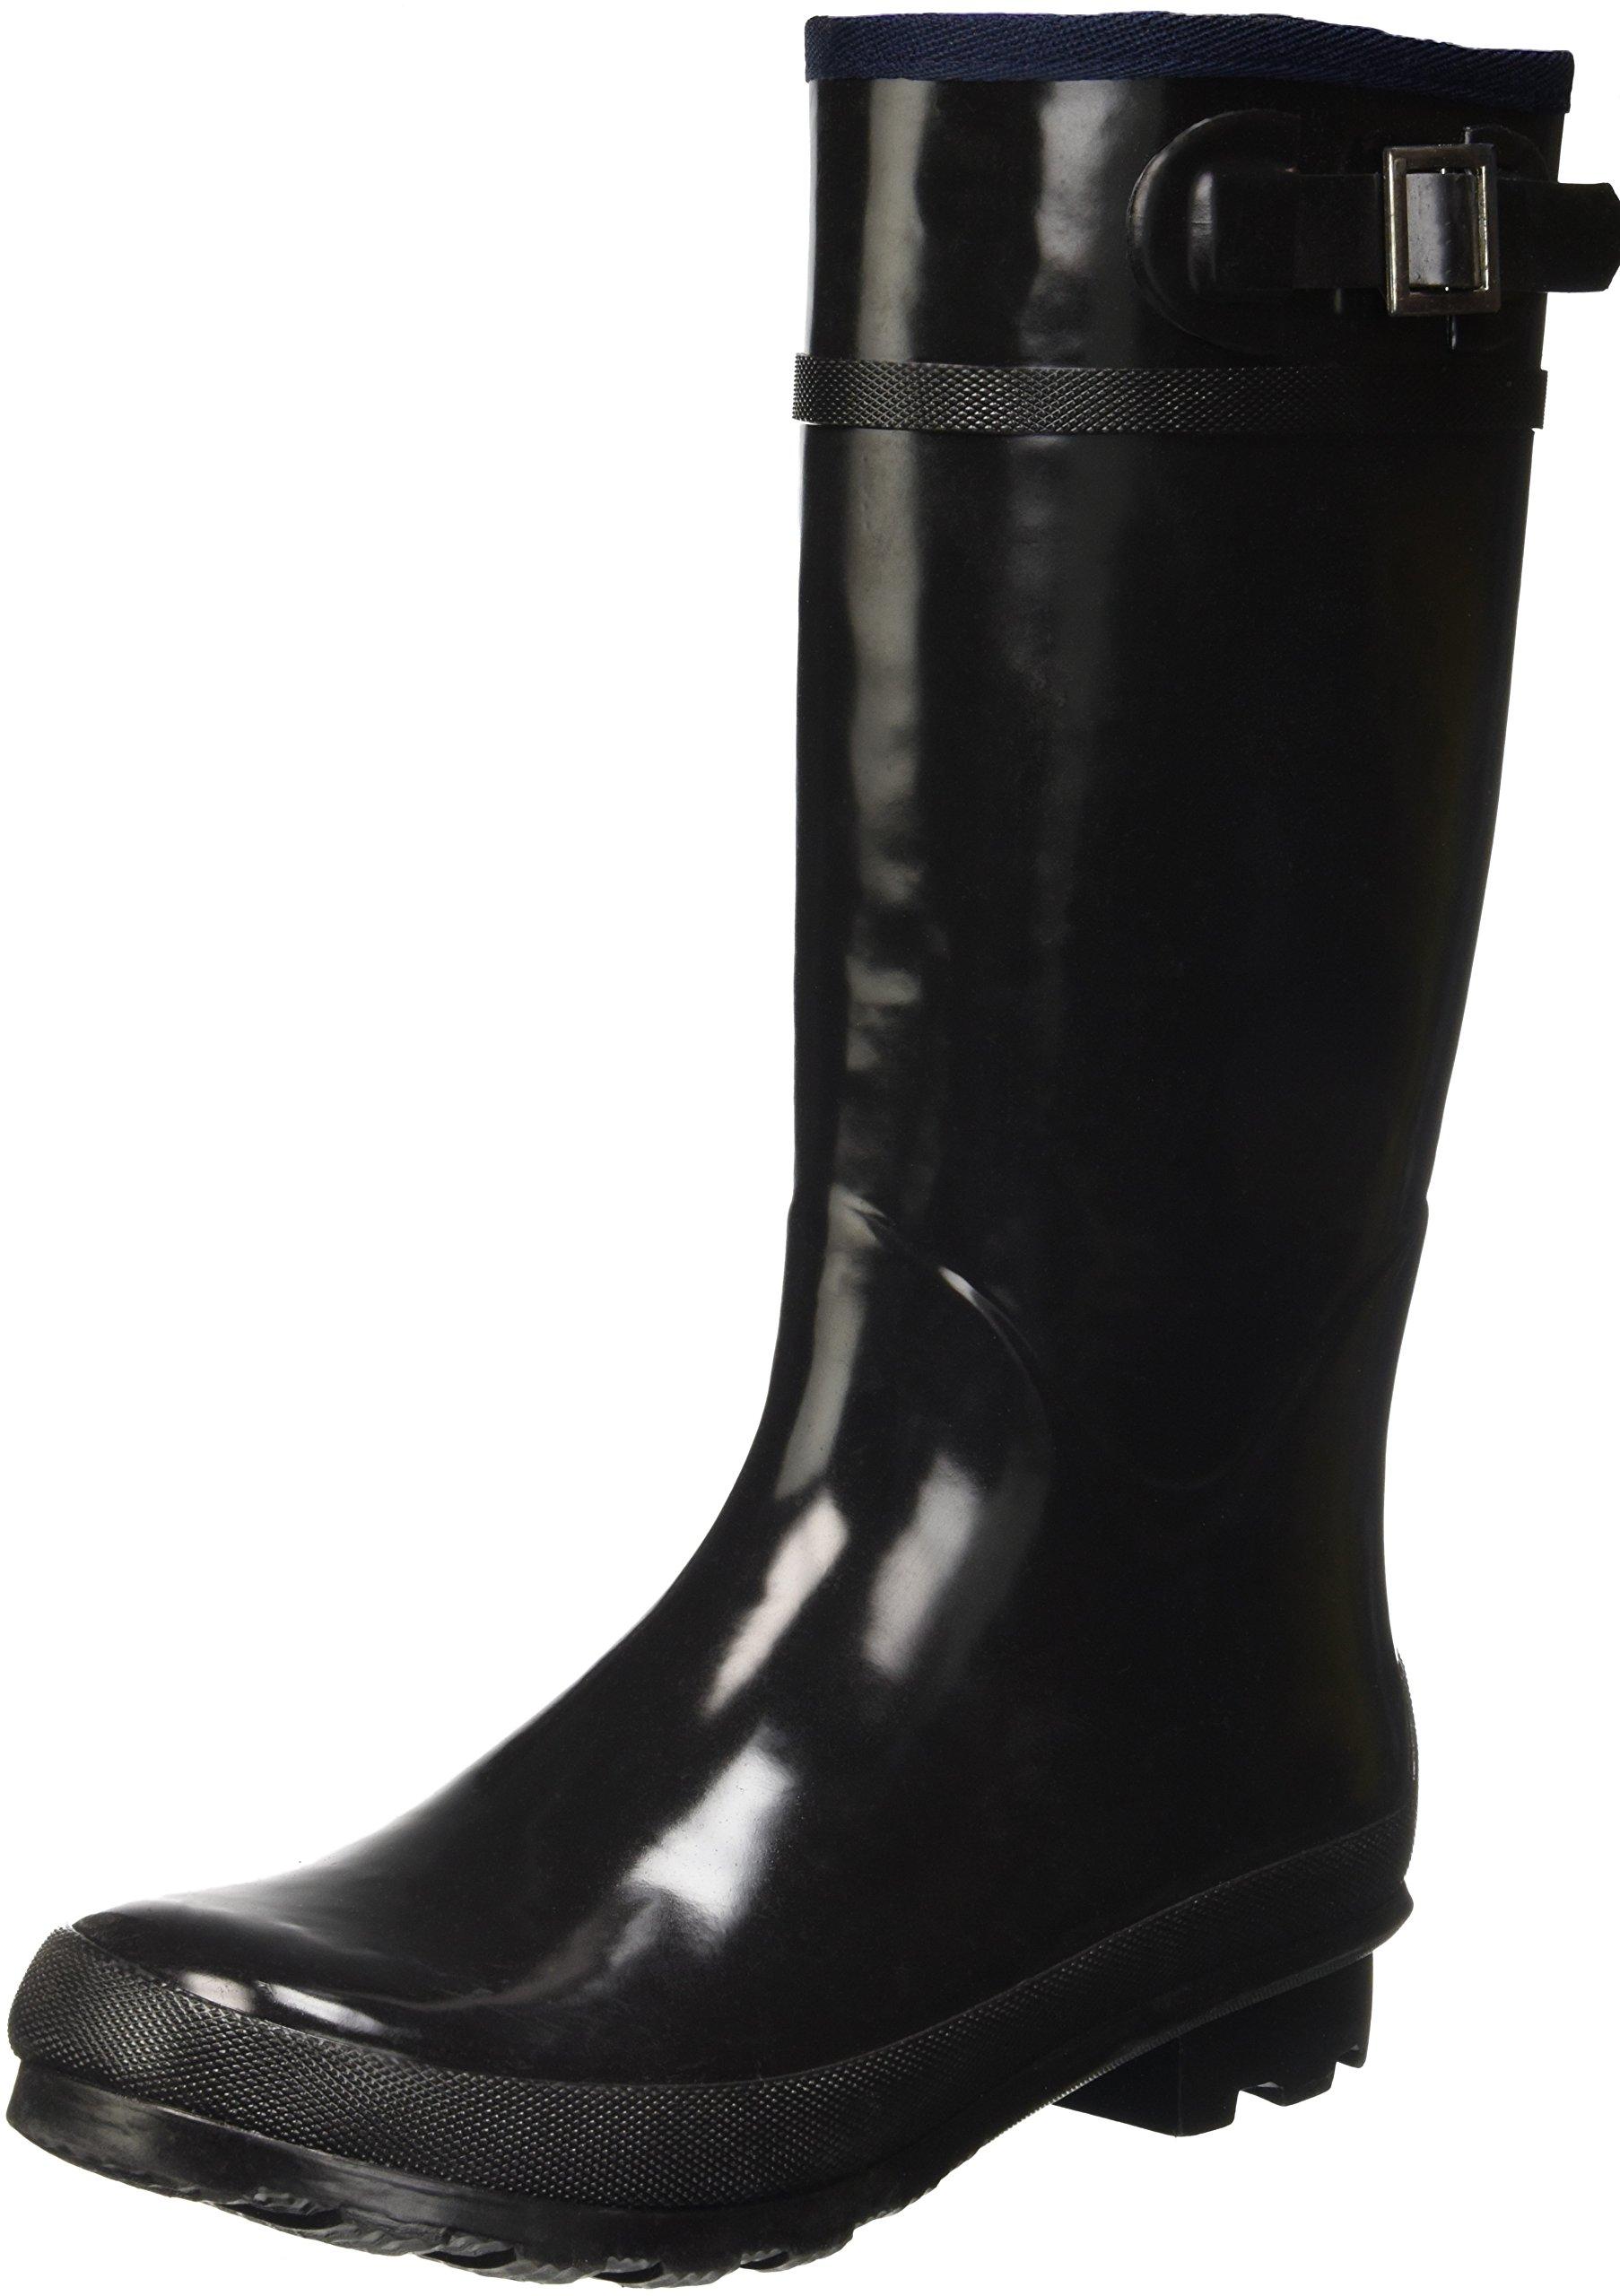 TG. 38 EU Superga 792Rbrw Stivali Donna Nero 999 Black 38 R7C